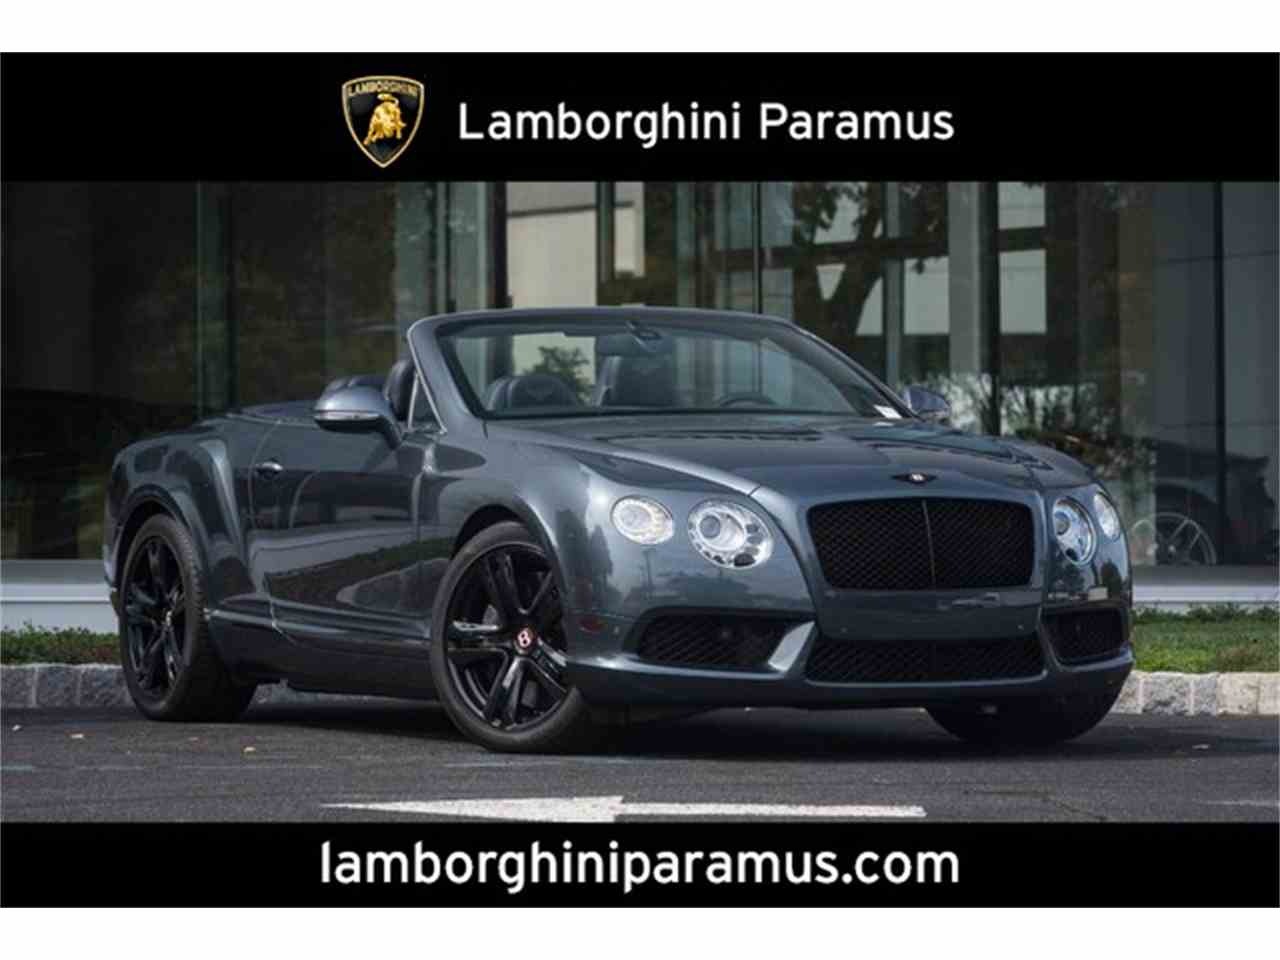 2013 Bentley Continental GTC V8 for Sale | ClassicCars.com | CC-1060365